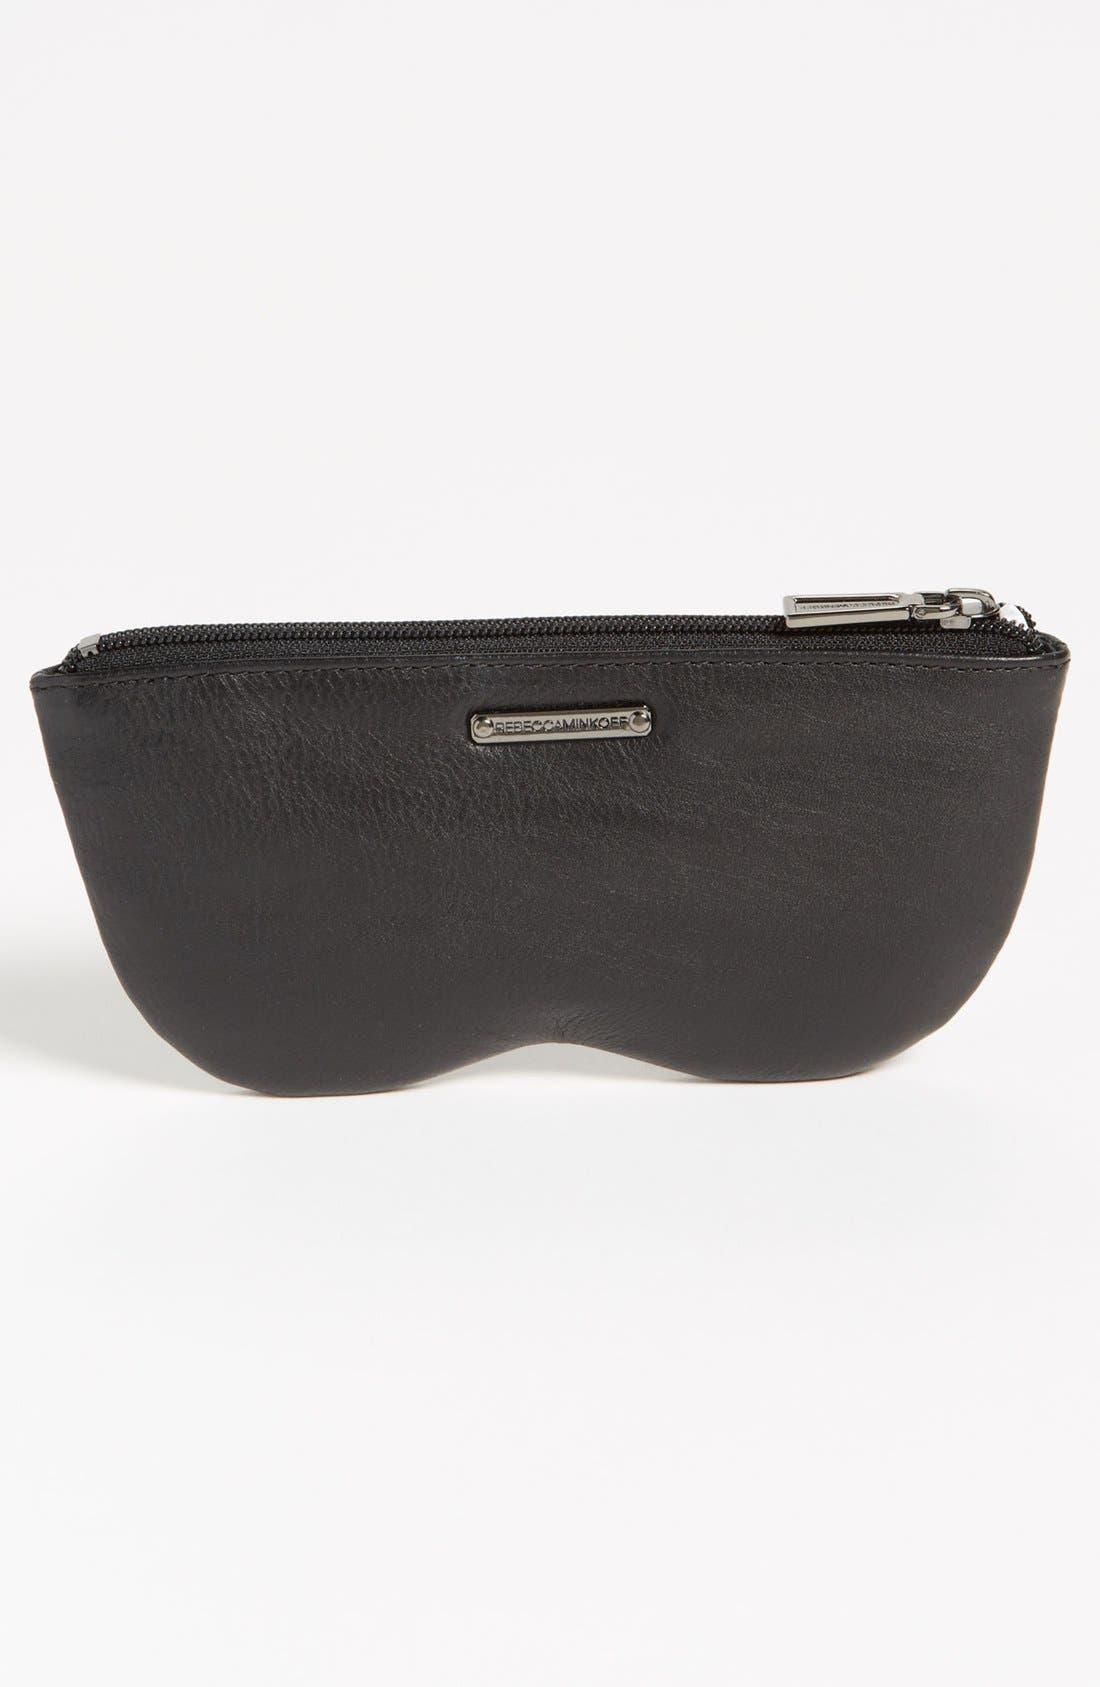 Alternate Image 4  - Rebecca Minkoff 'Sun Specs' Leather Sunglasses Case